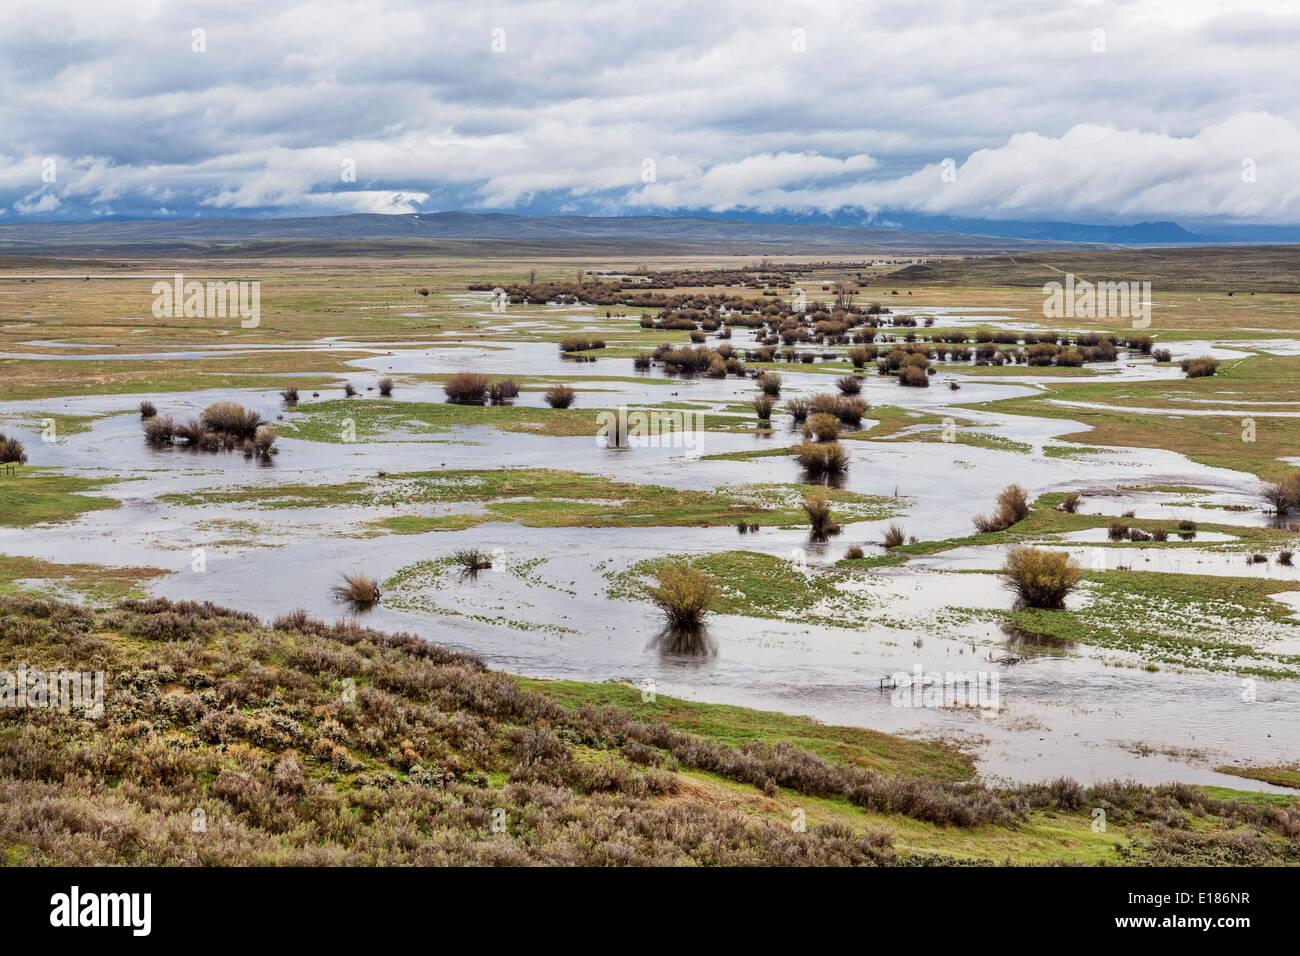 Illinois River meanders through Arapaho National Wildlife Refuge, North Park near Walden, Colorado - Stock Image